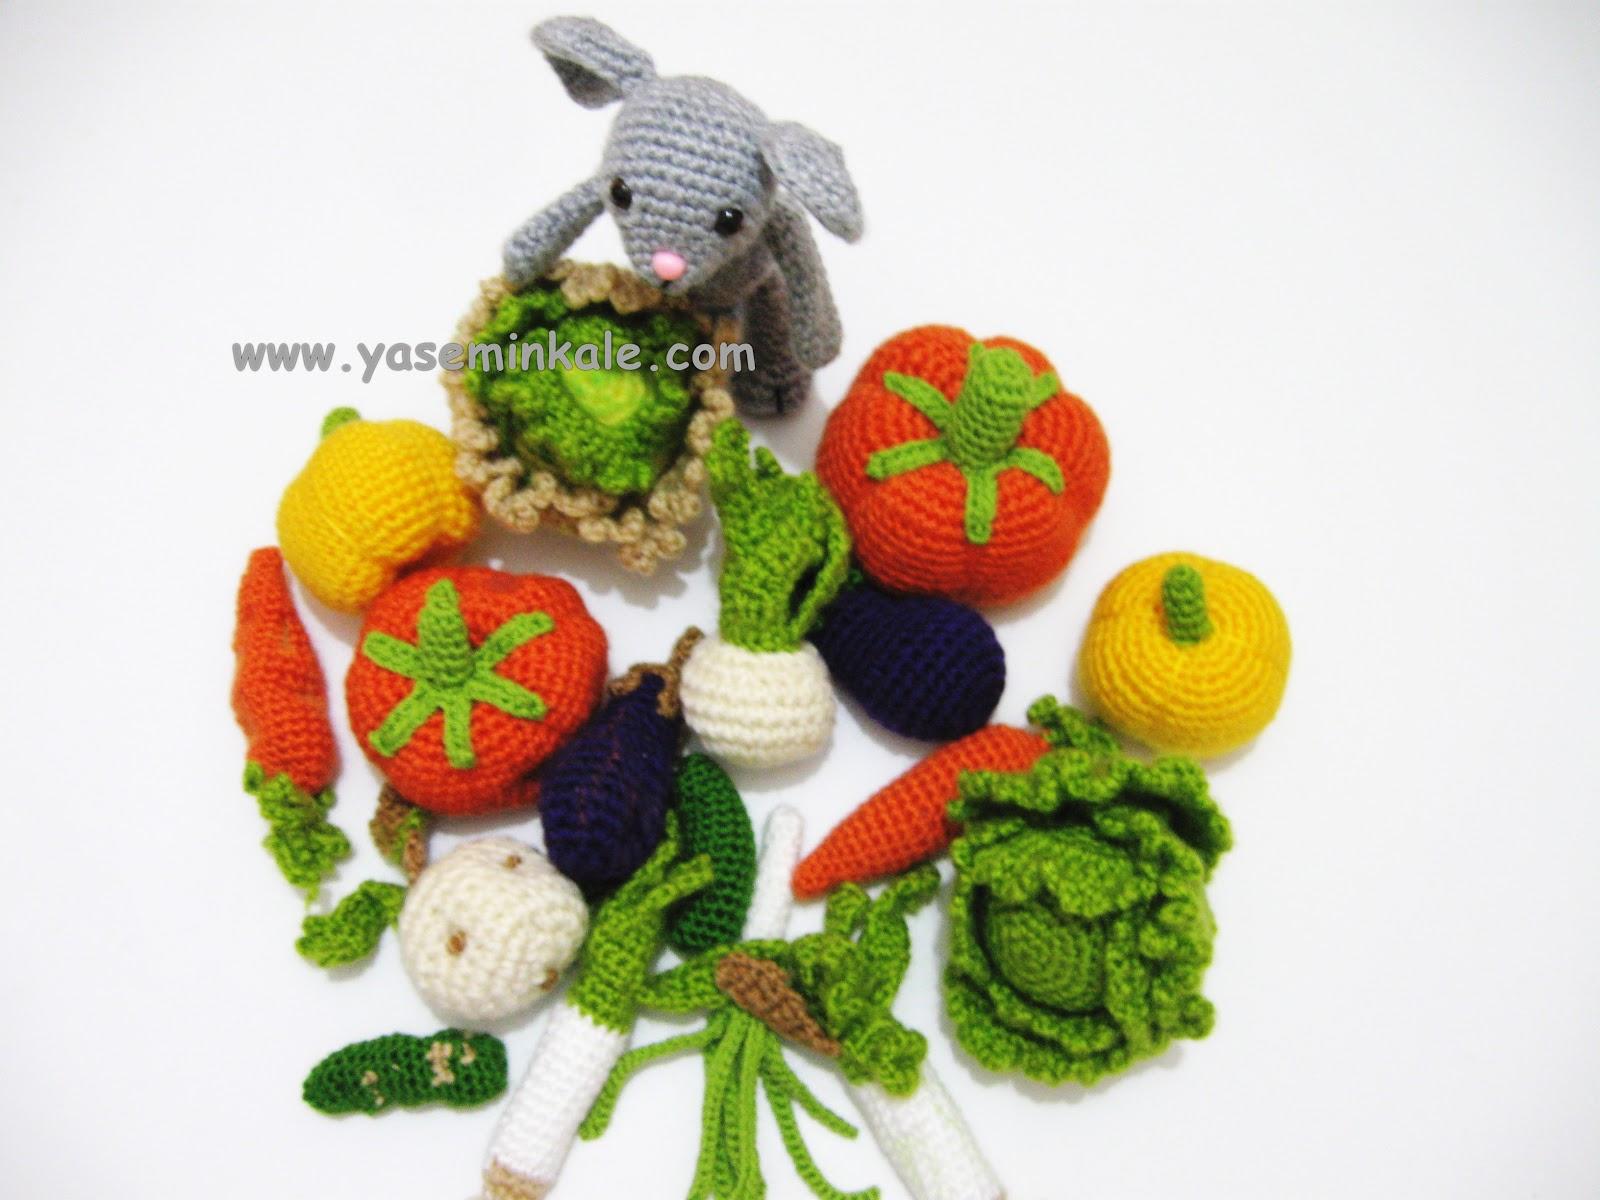 Amigurumi Vegetables : Yaseminkale �rg� sebzeler amigurumi vegetables